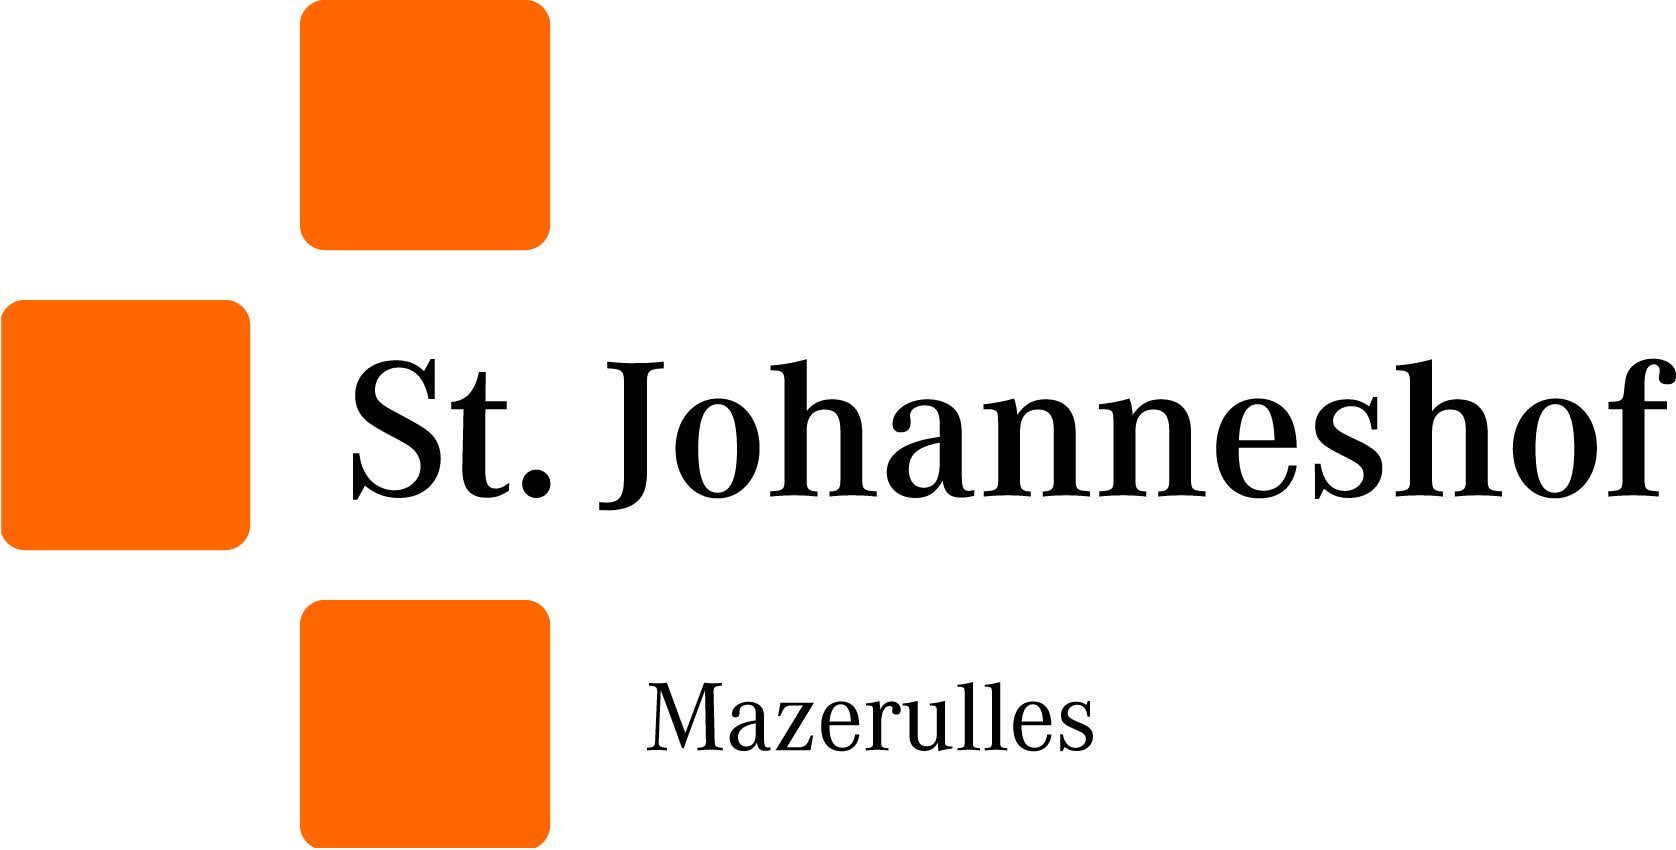 St. Johanneshof Mazerulles